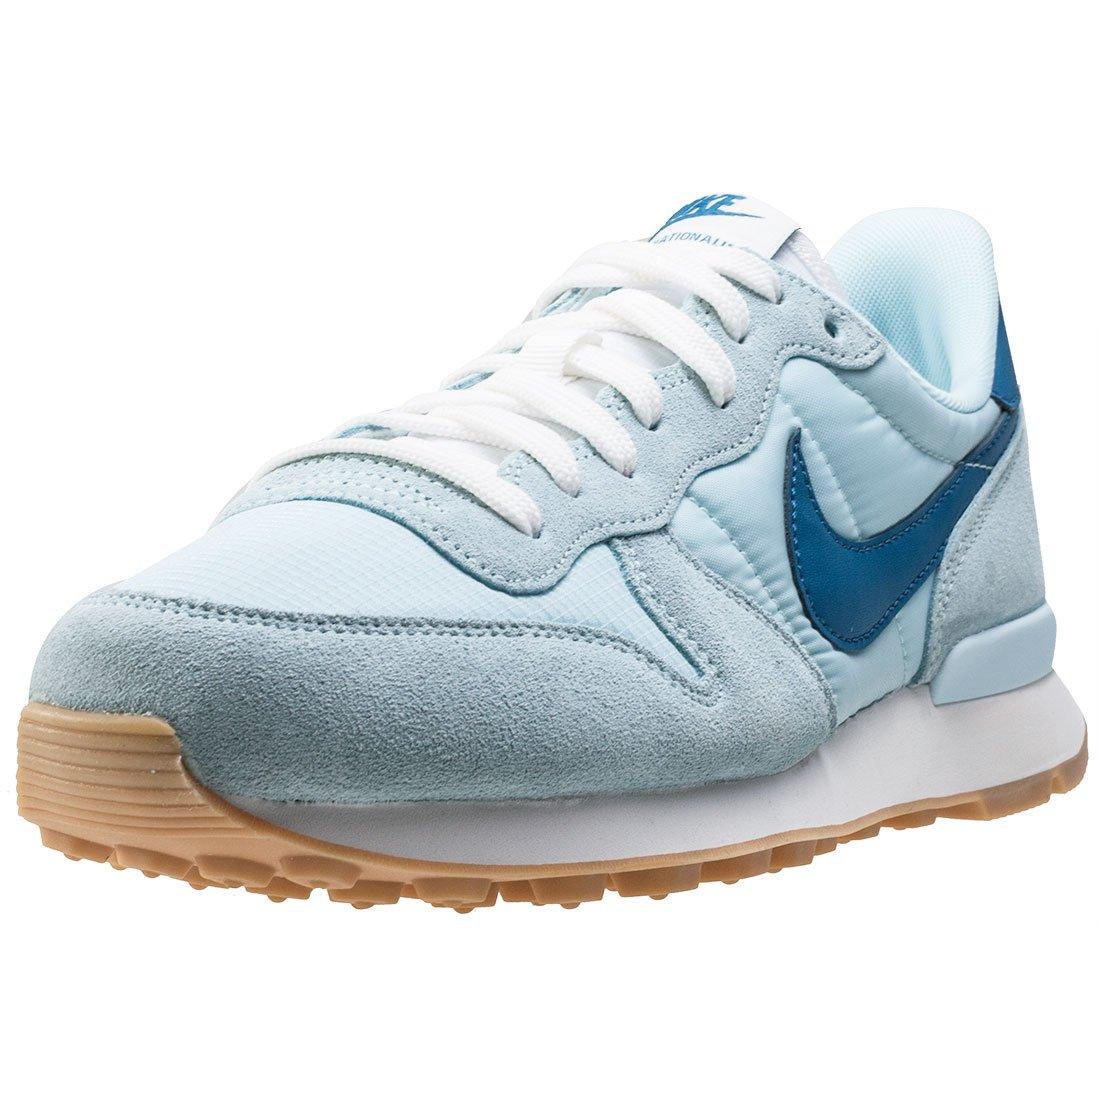 new product ed89d be963 Nike Femme Nike Internationalist Internationalist Internationalist 28c3dd